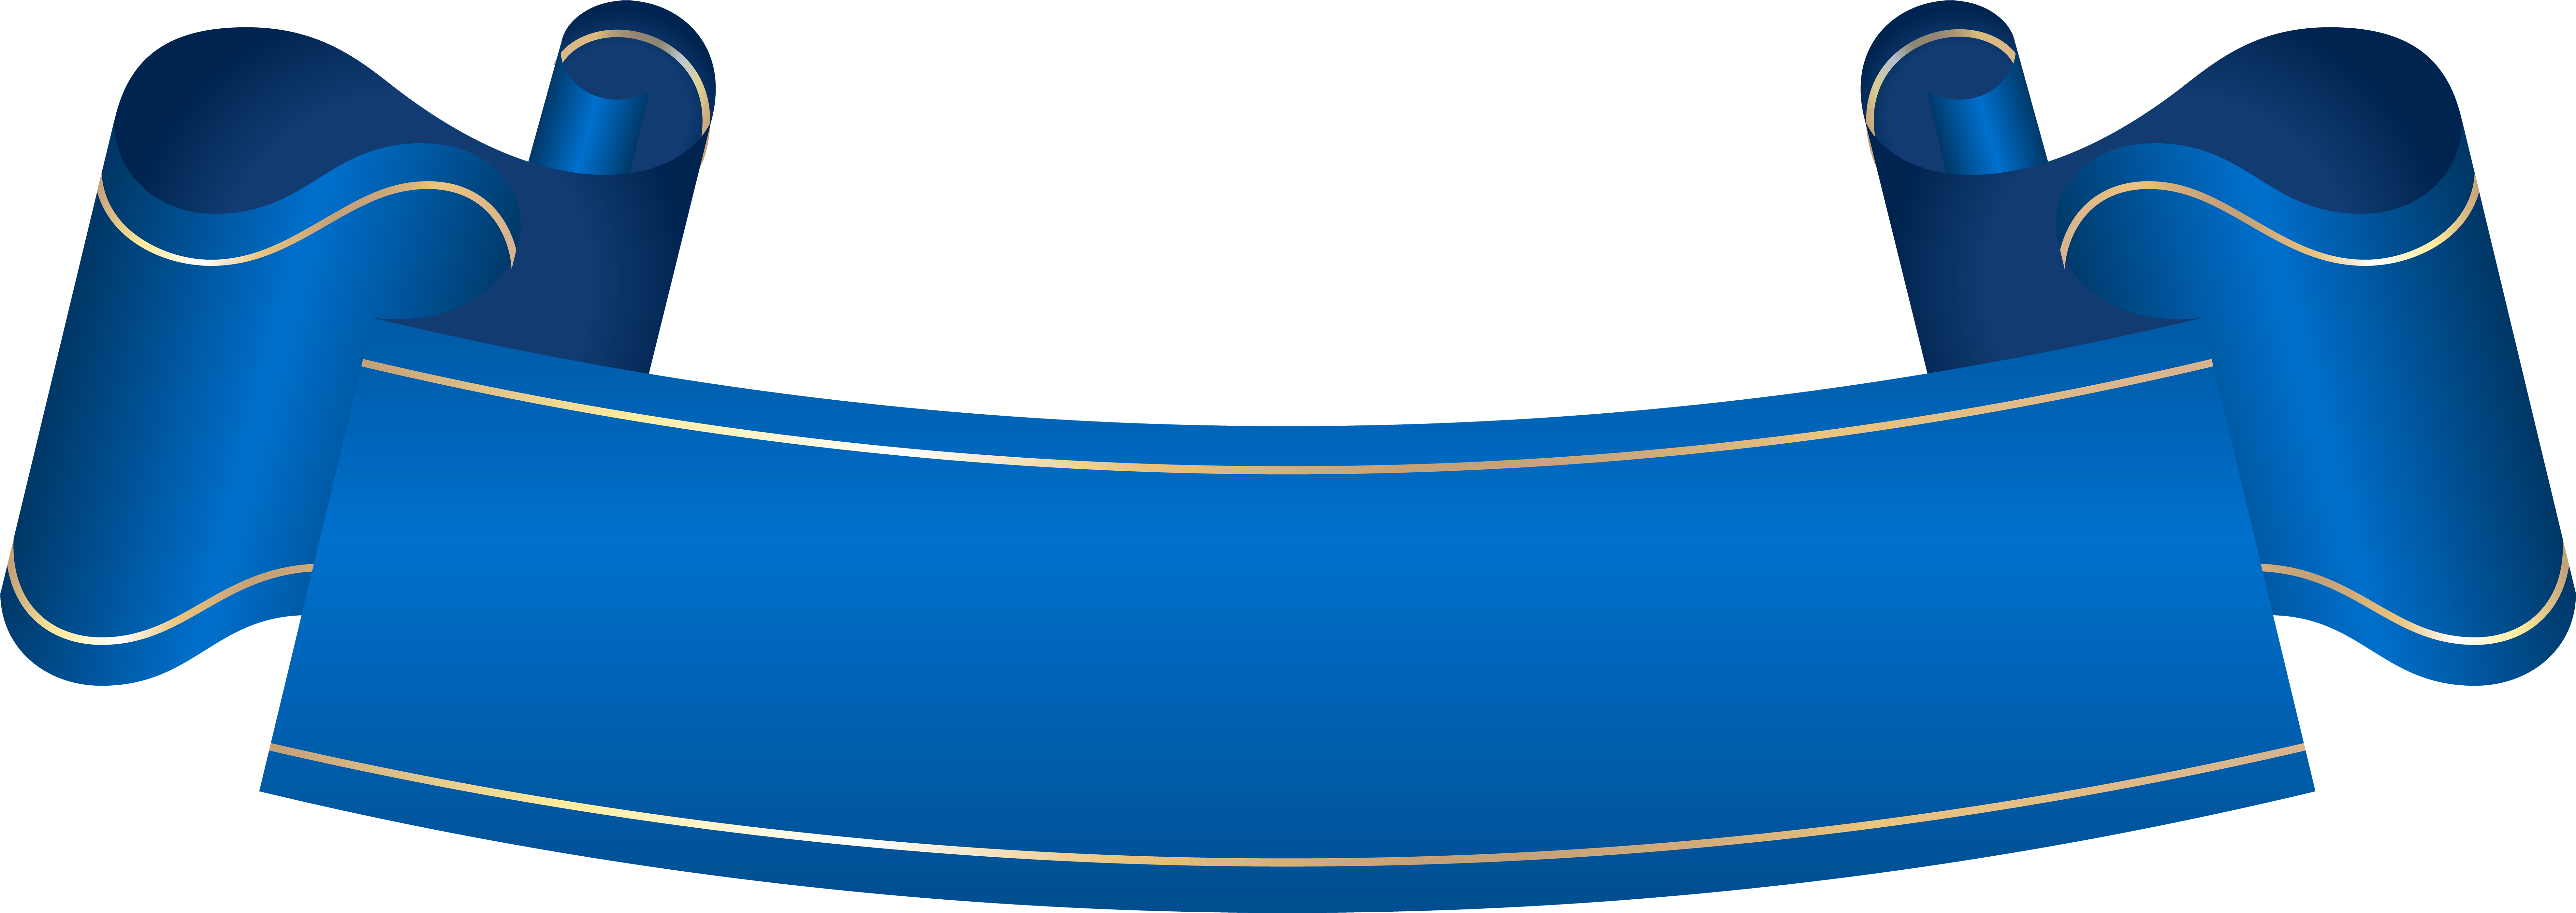 Blue Banner Transparent Clip Art.